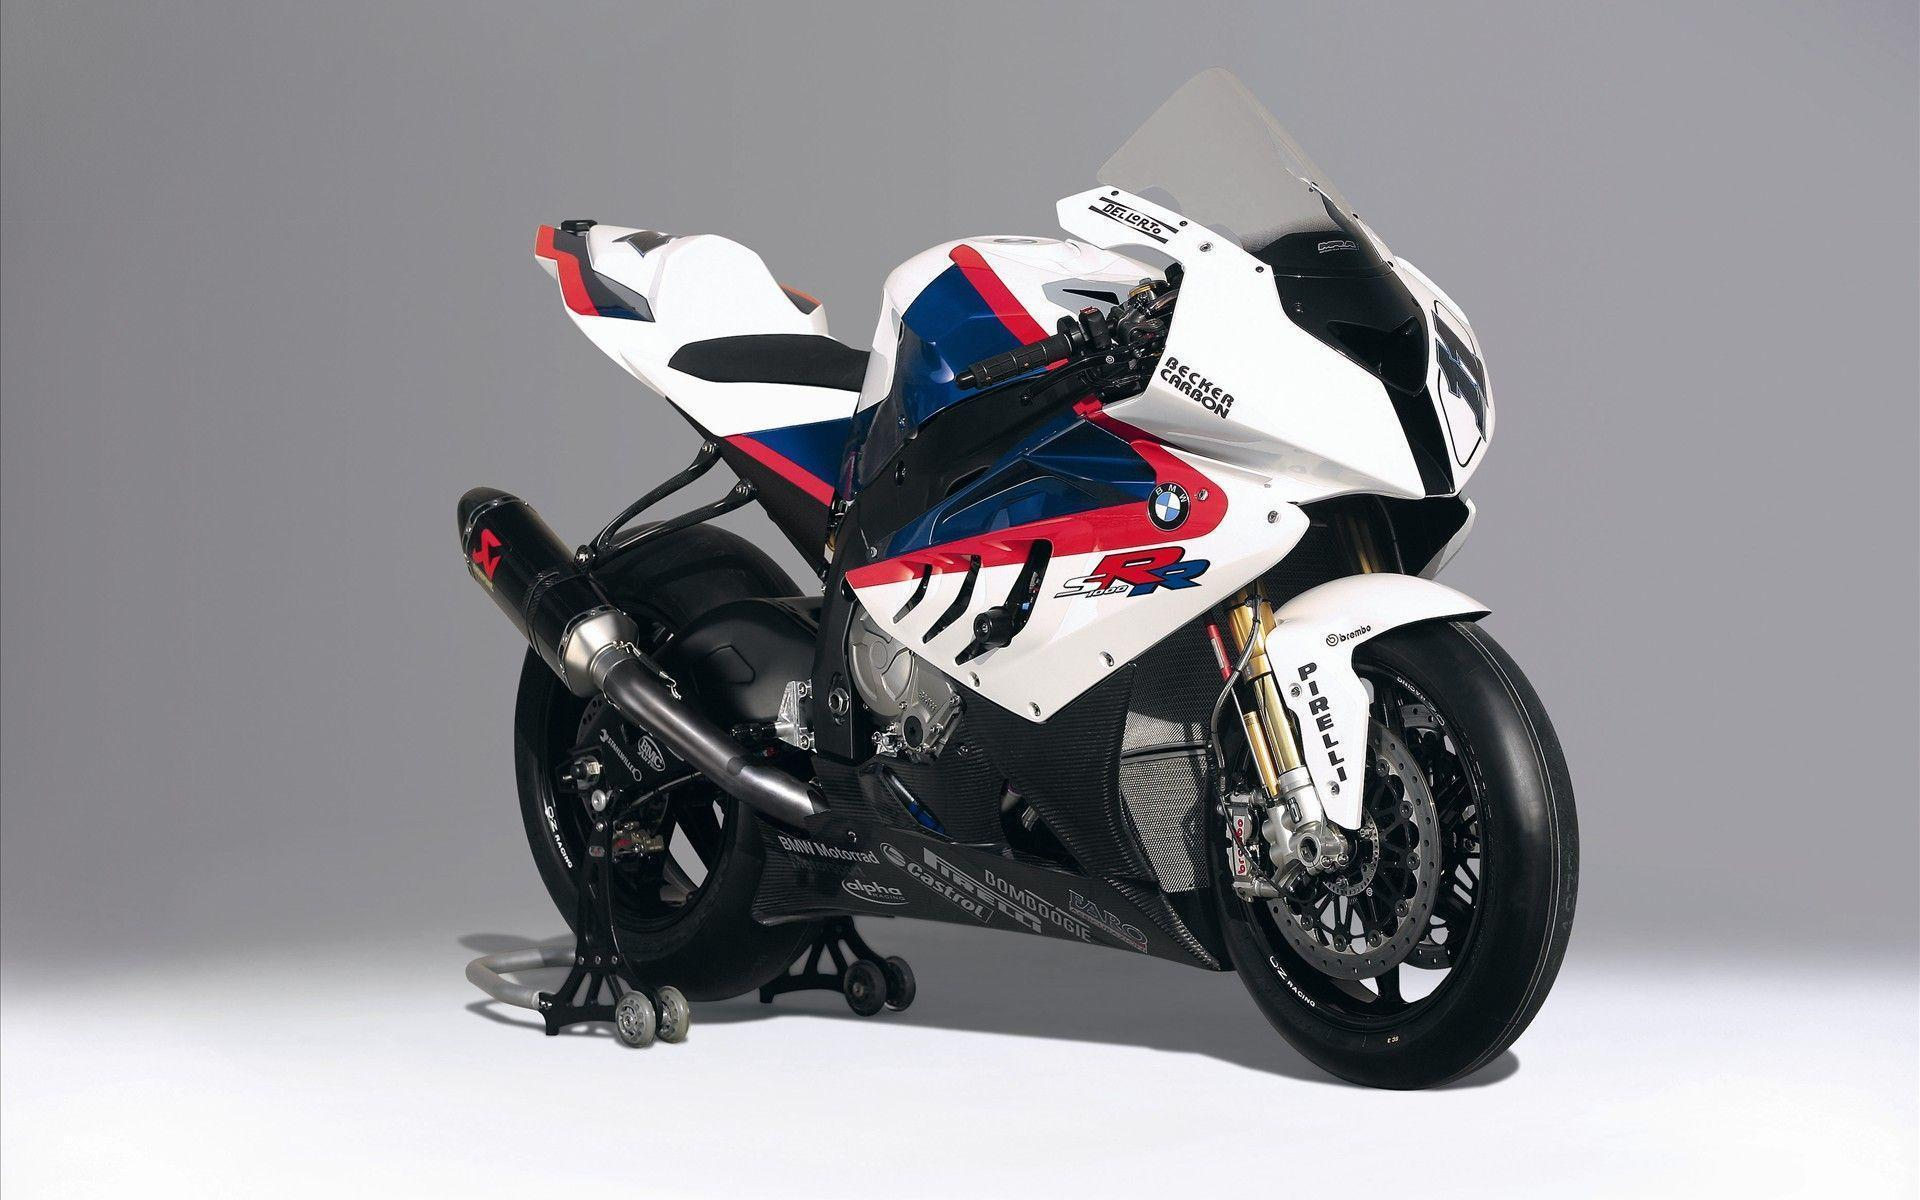 Bmw Motorcycles India Price